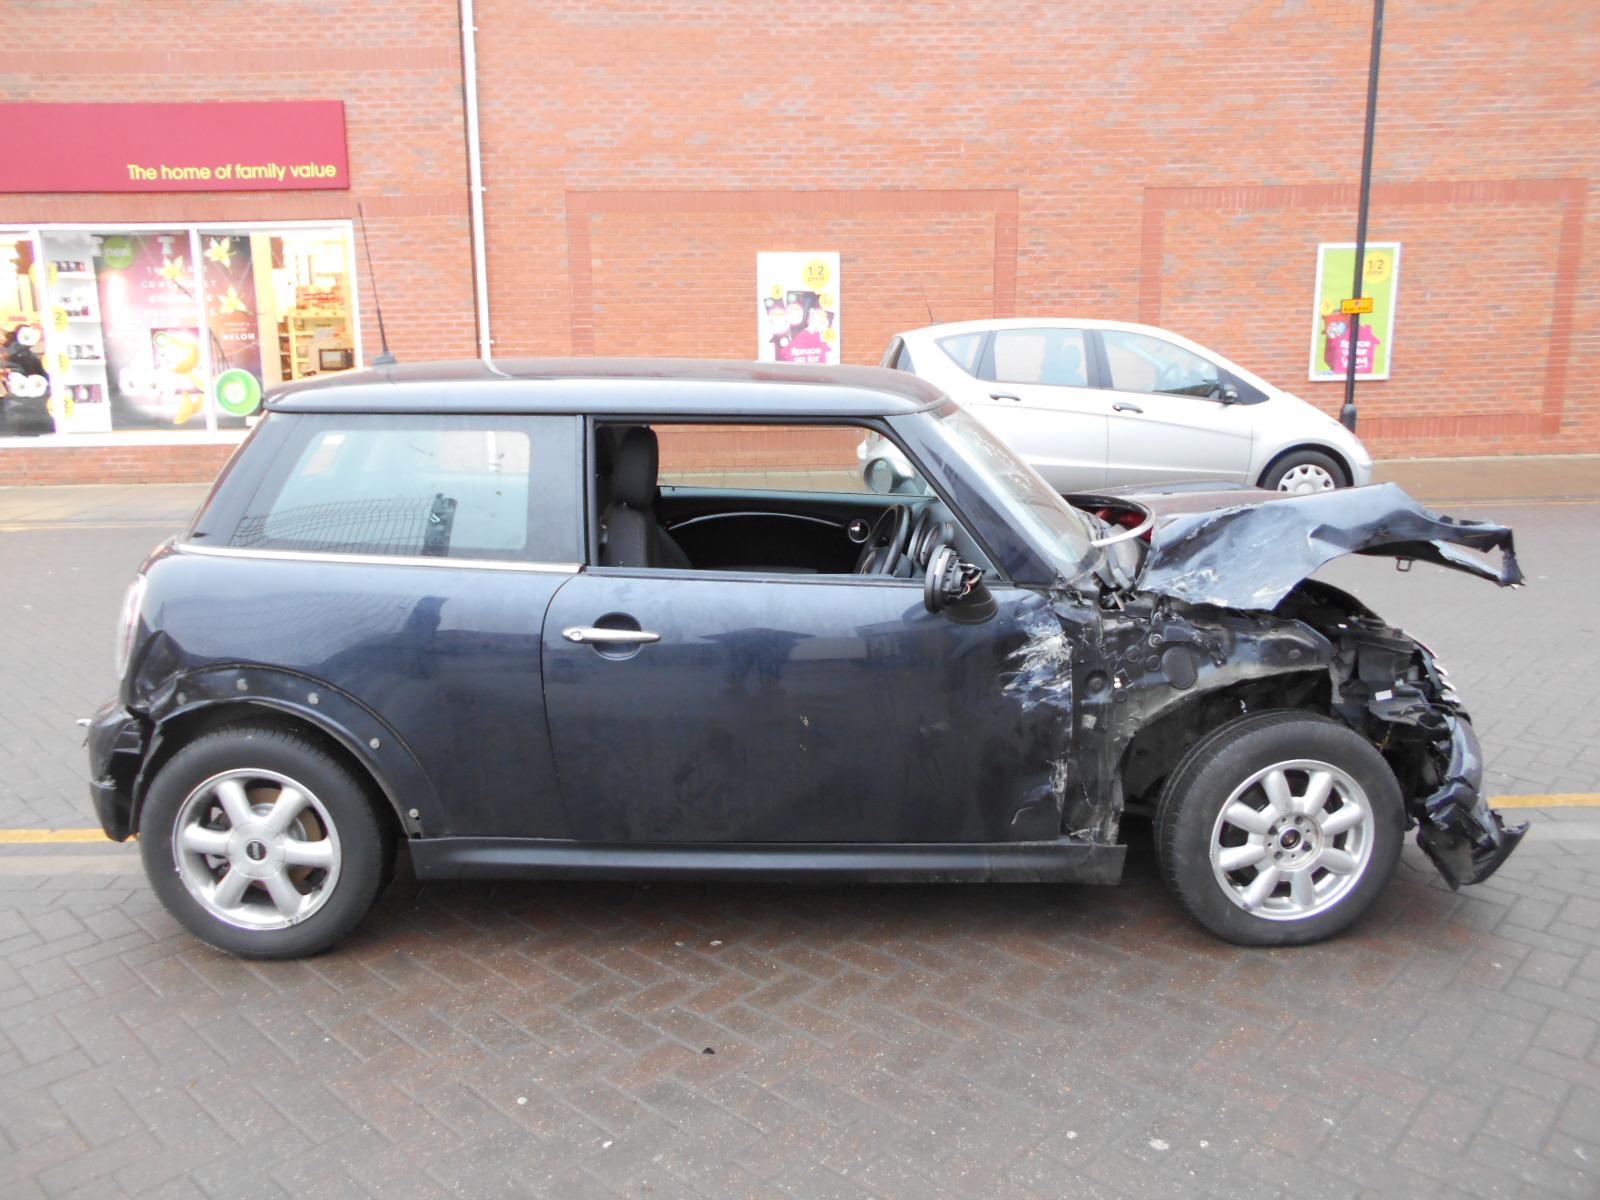 08 Black 1.4 BMW Mini One - 1